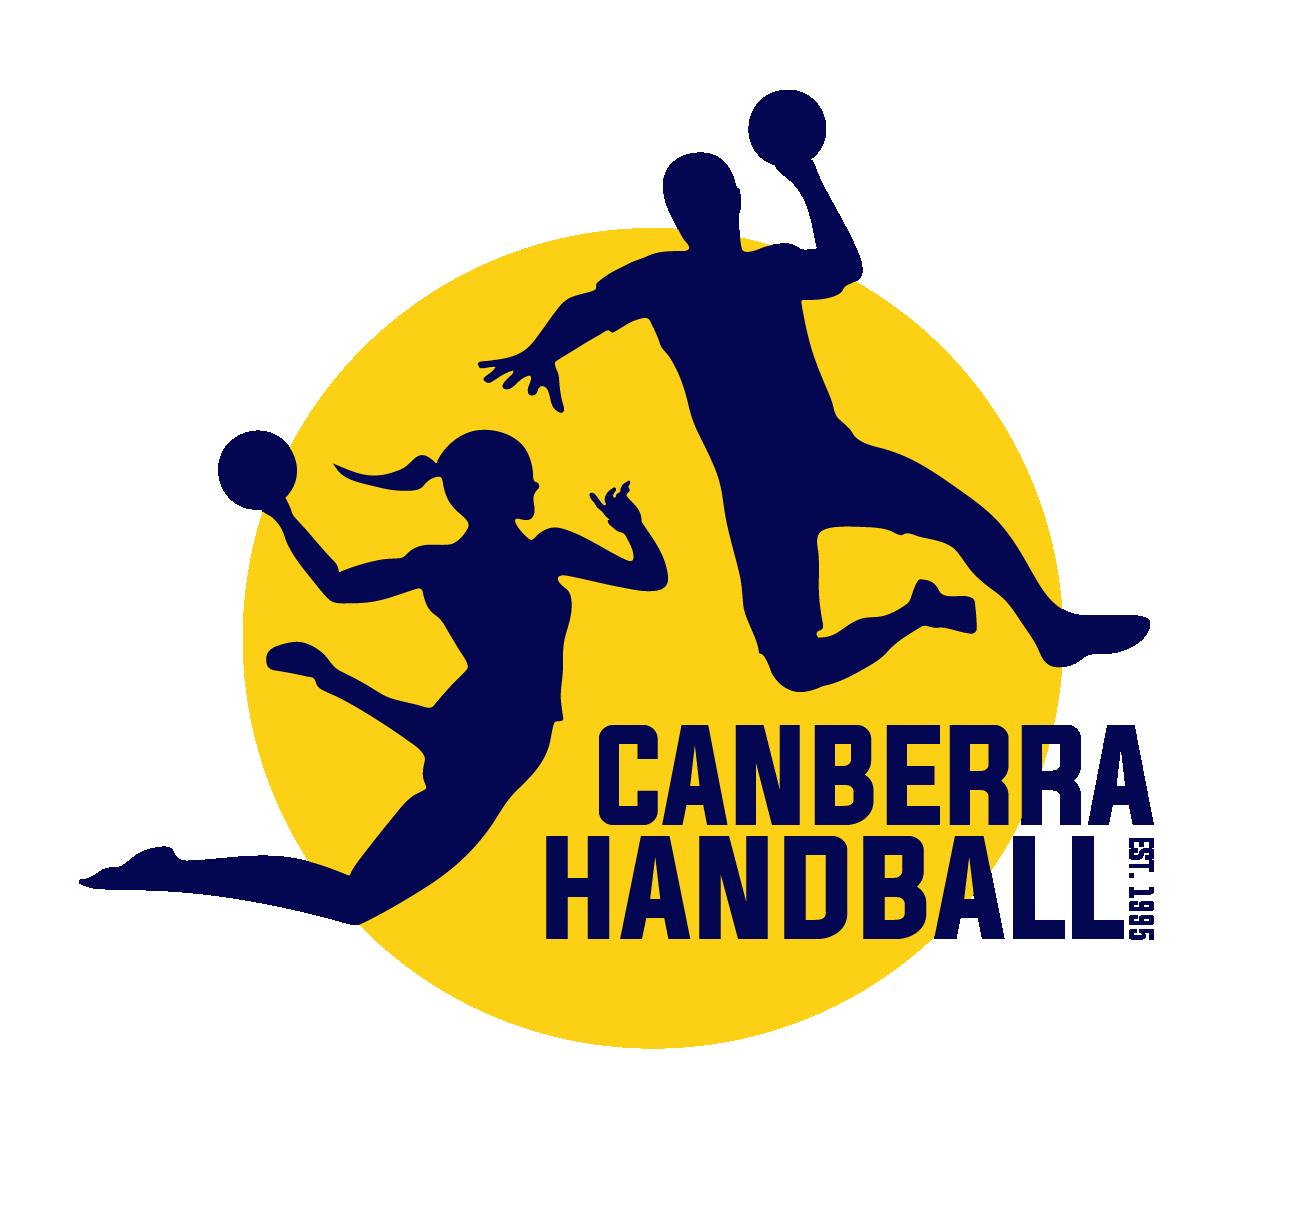 Canberra Handball Logo